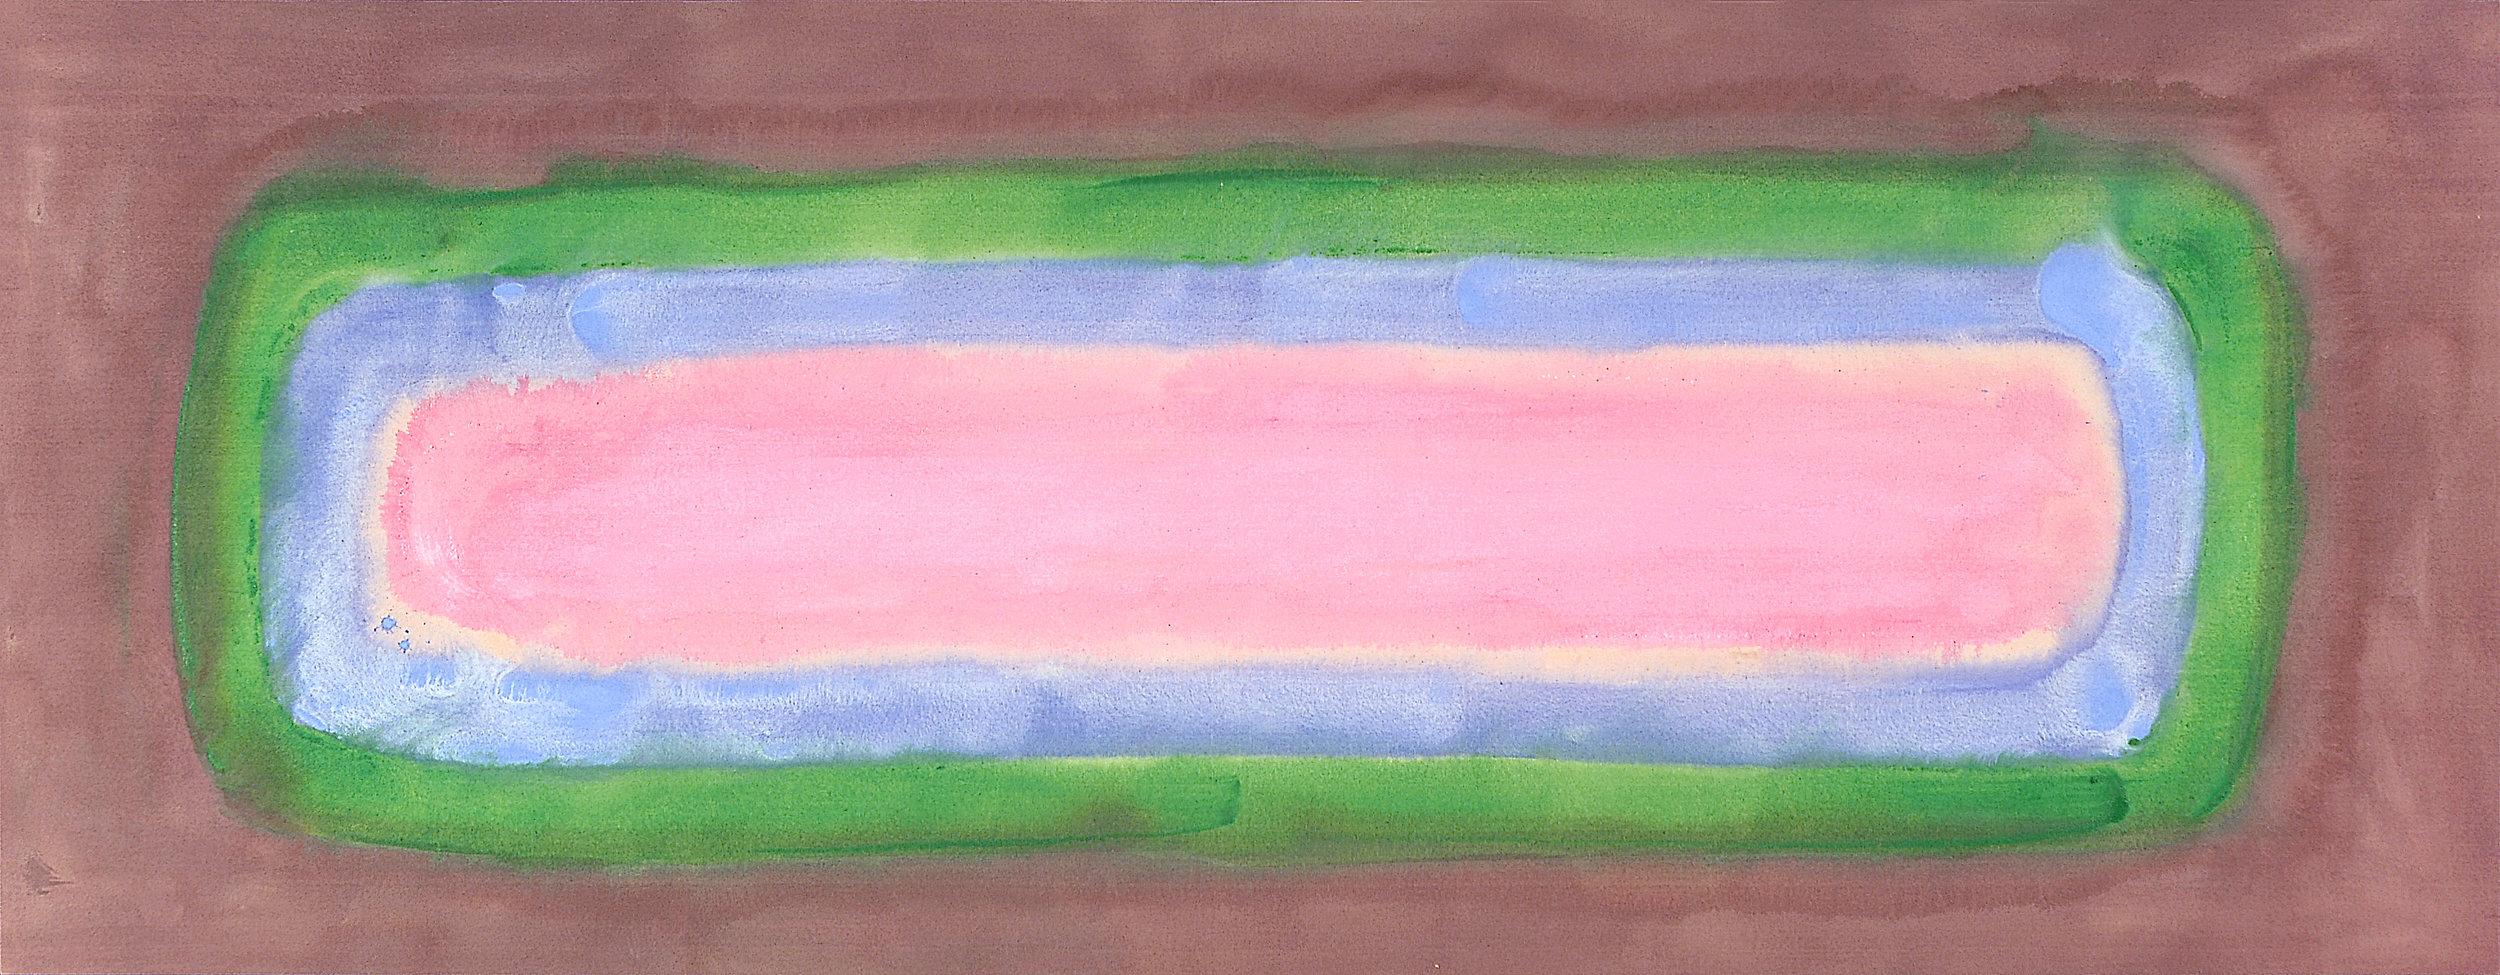 AC-87-129, 1987, 44 x 113 inches, Acrylic on canvas